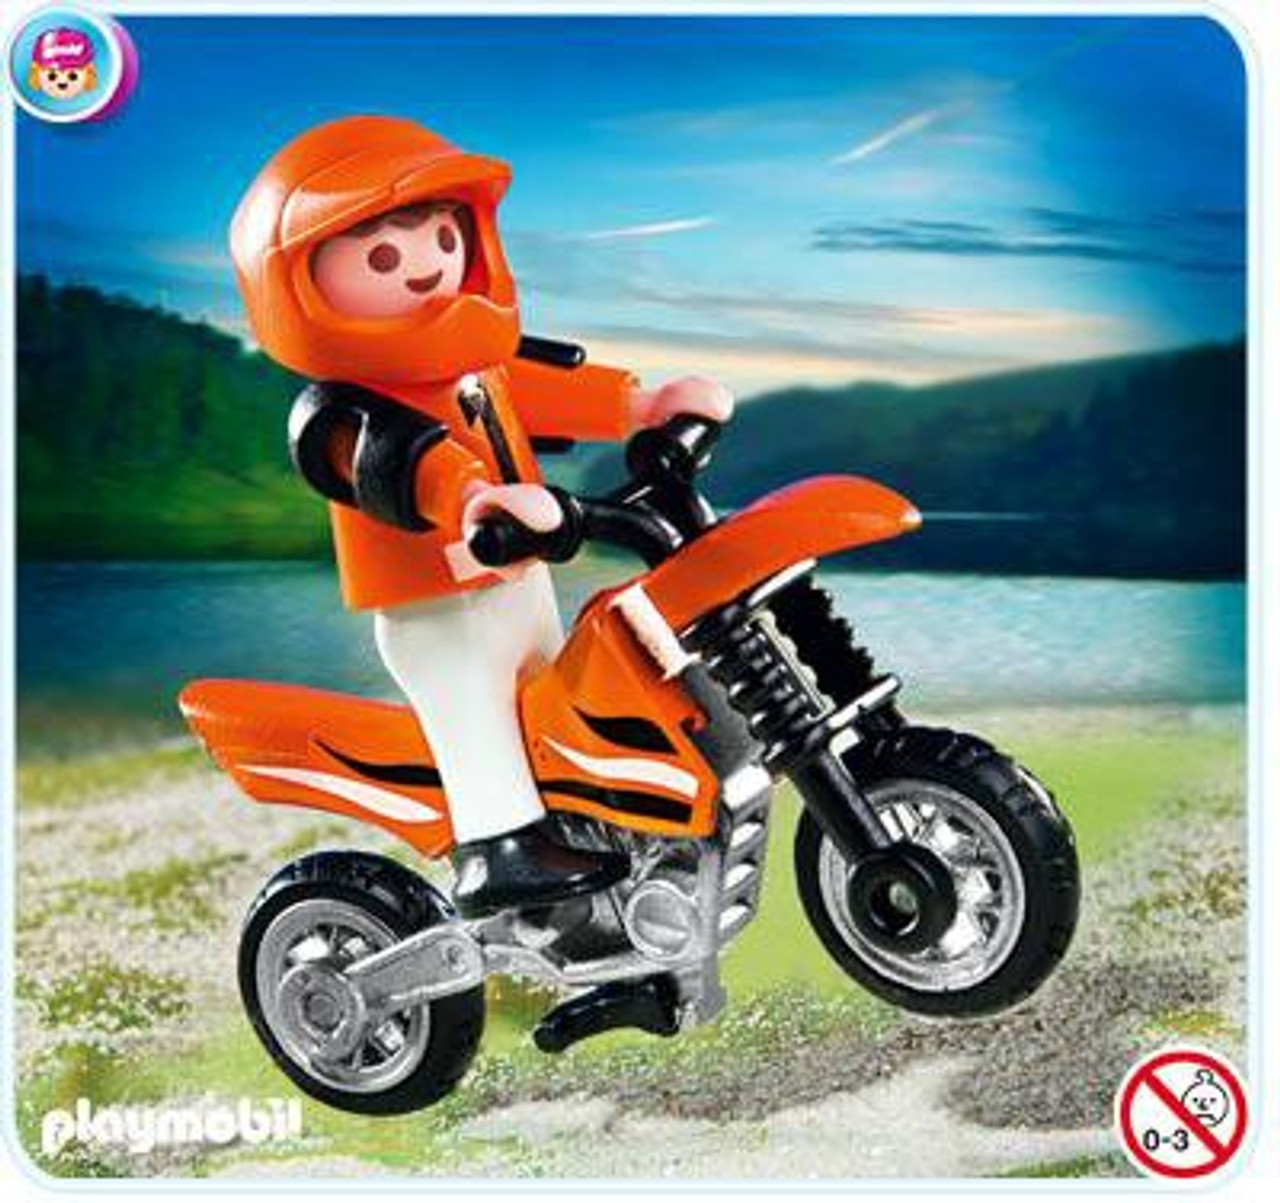 Playmobil Transport Motocross Boy Set #4698